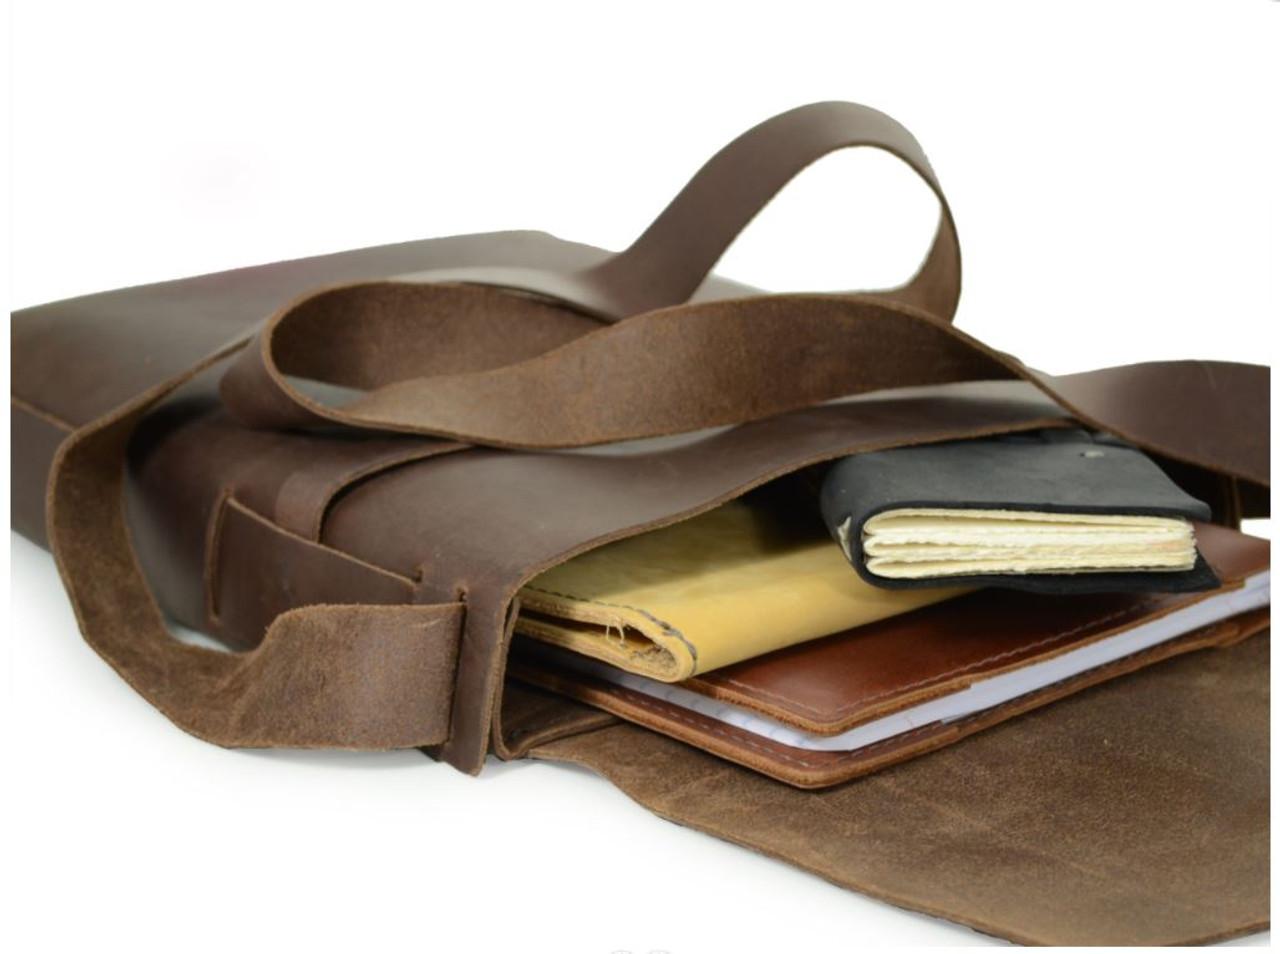 Leather Satchel - Explorer by Rustico - Dark Brown - Inside